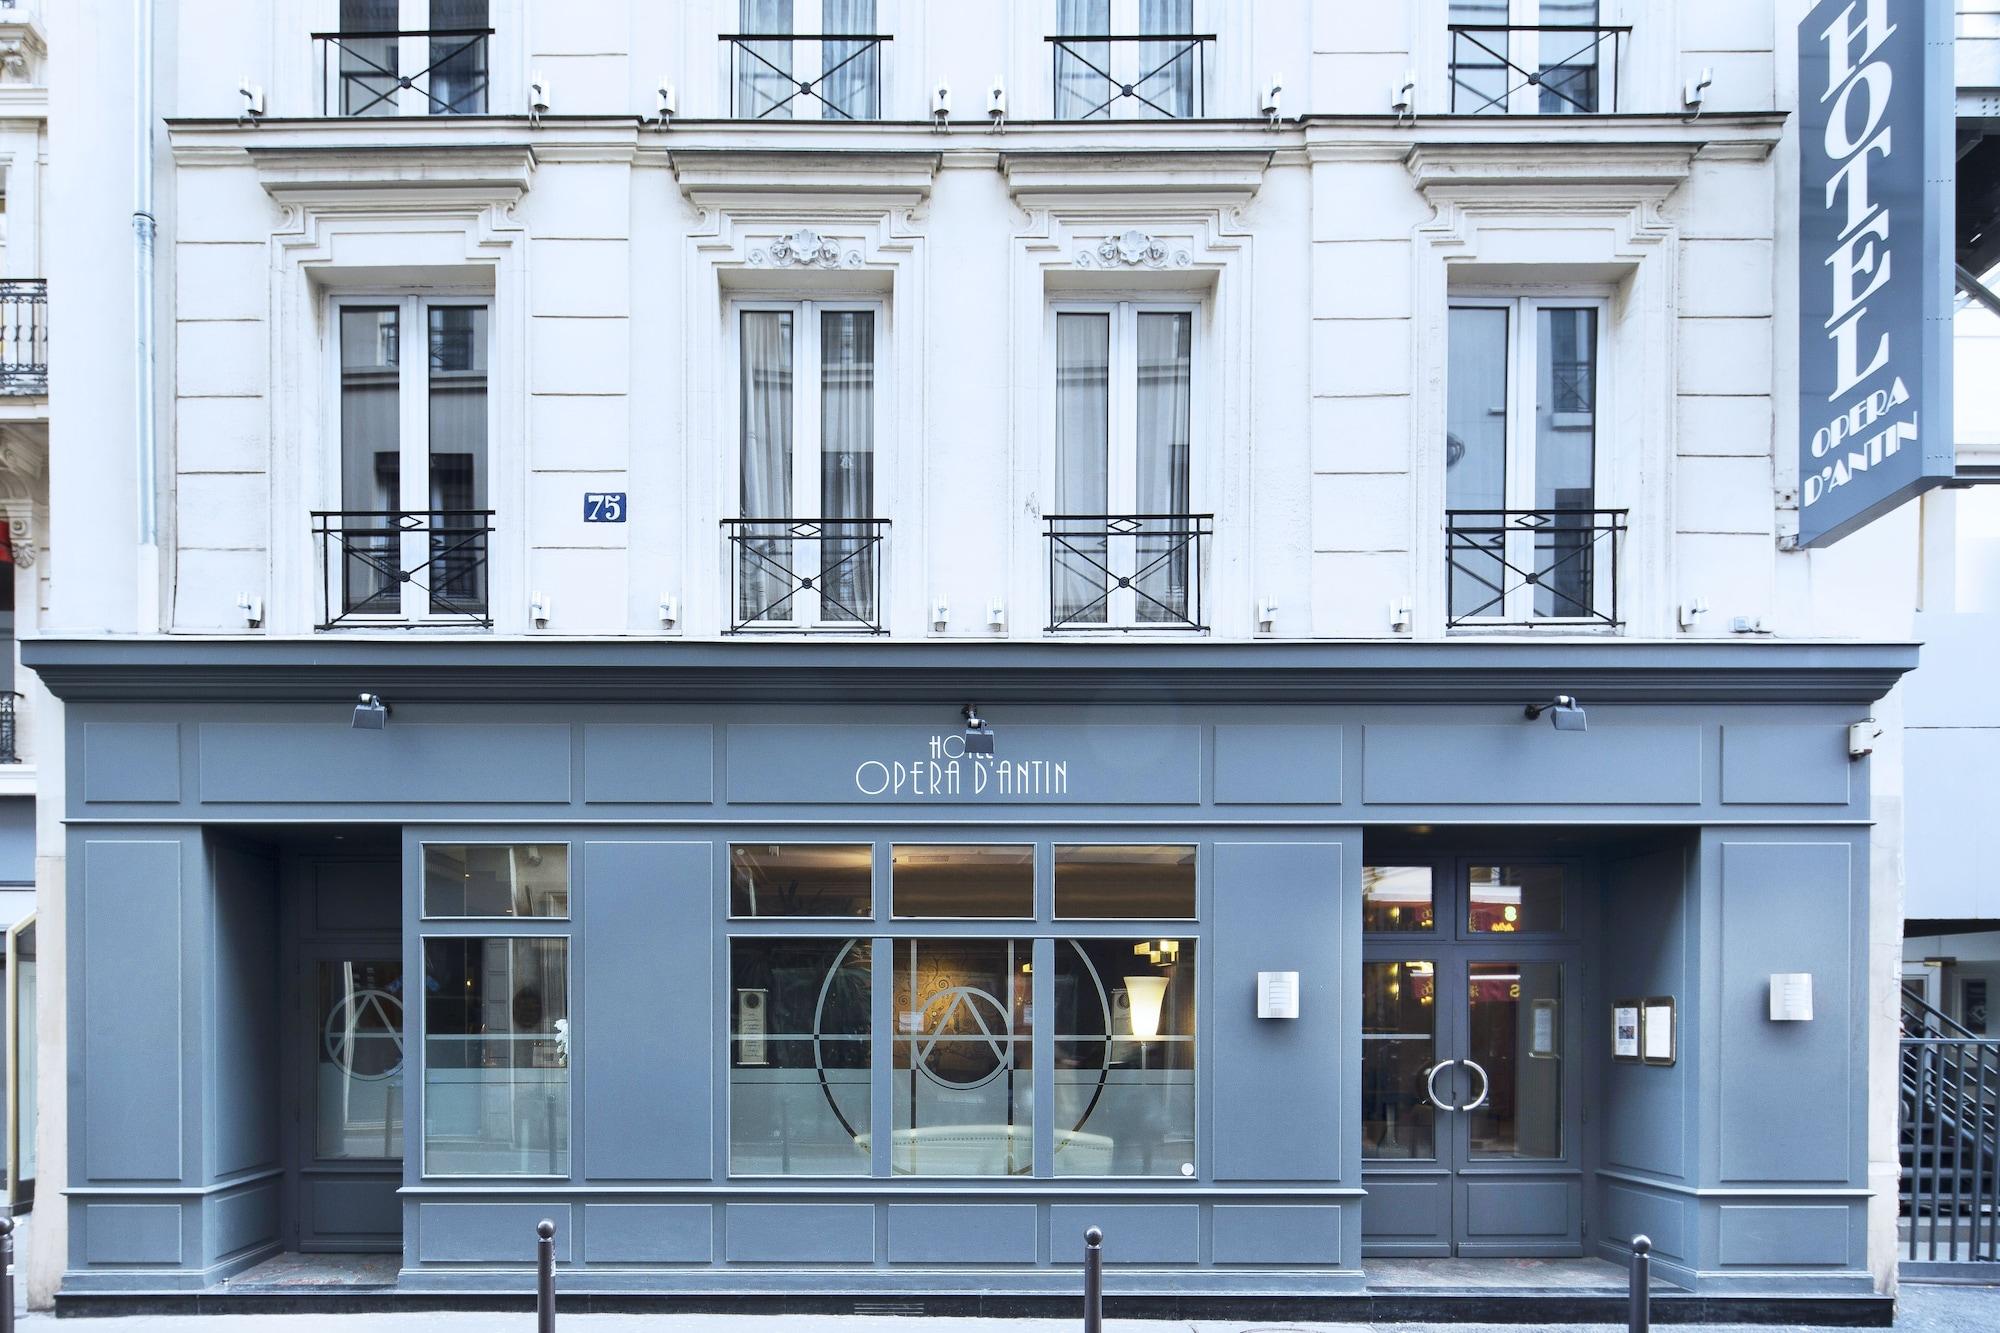 Hotel Opera d'Antin, Paris